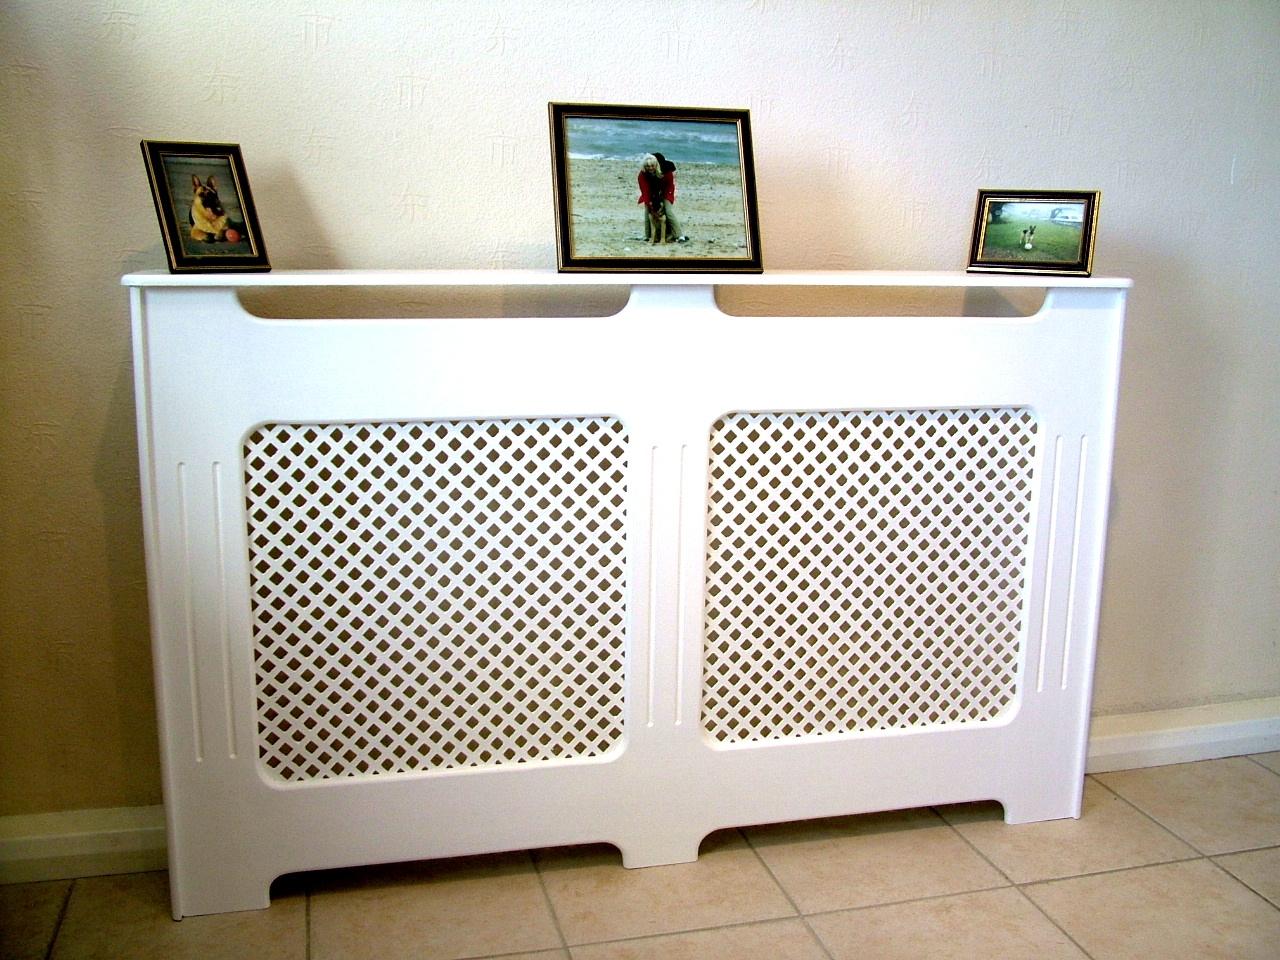 Broadland Radiator Cabinets Custom Made To Order Regarding Radiator Cupboards (Image 3 of 15)